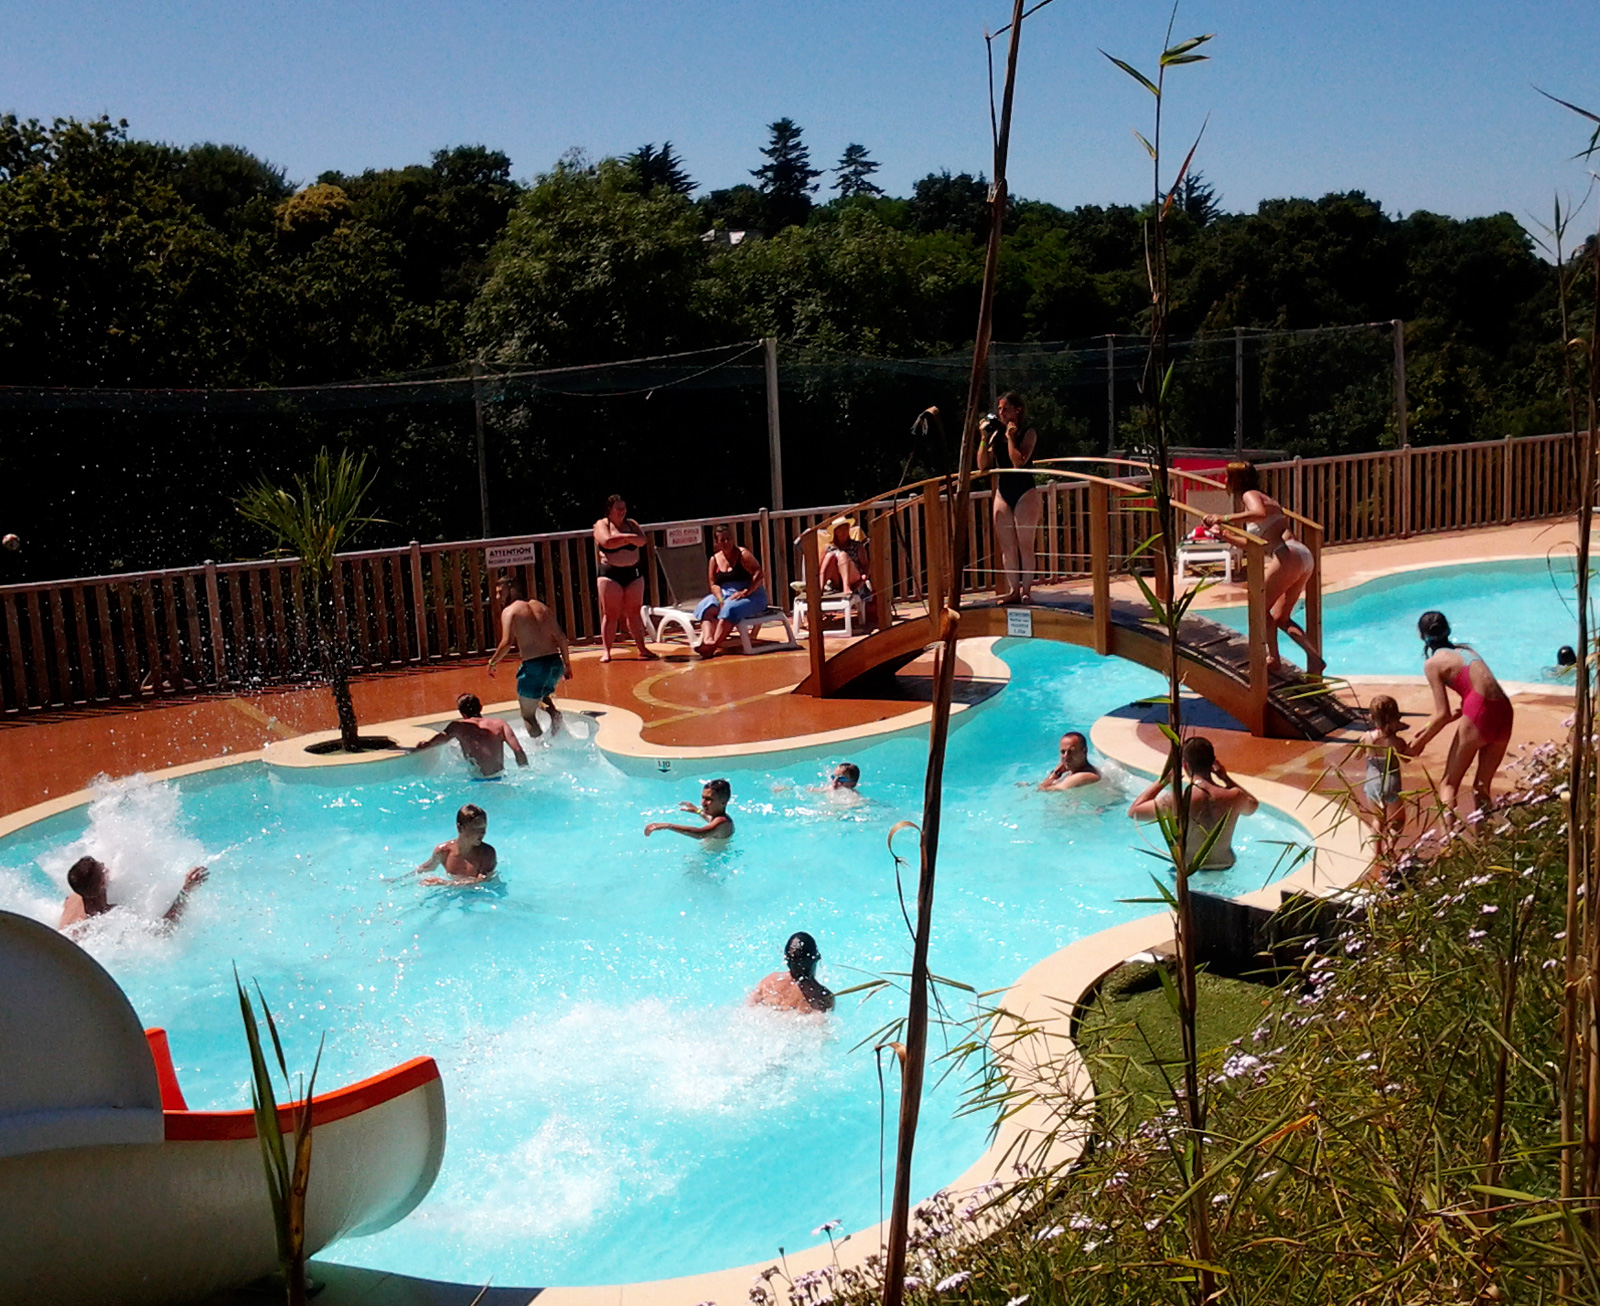 Camping en bretagne avec piscine couverte camping c tes for Camping dinard avec piscine